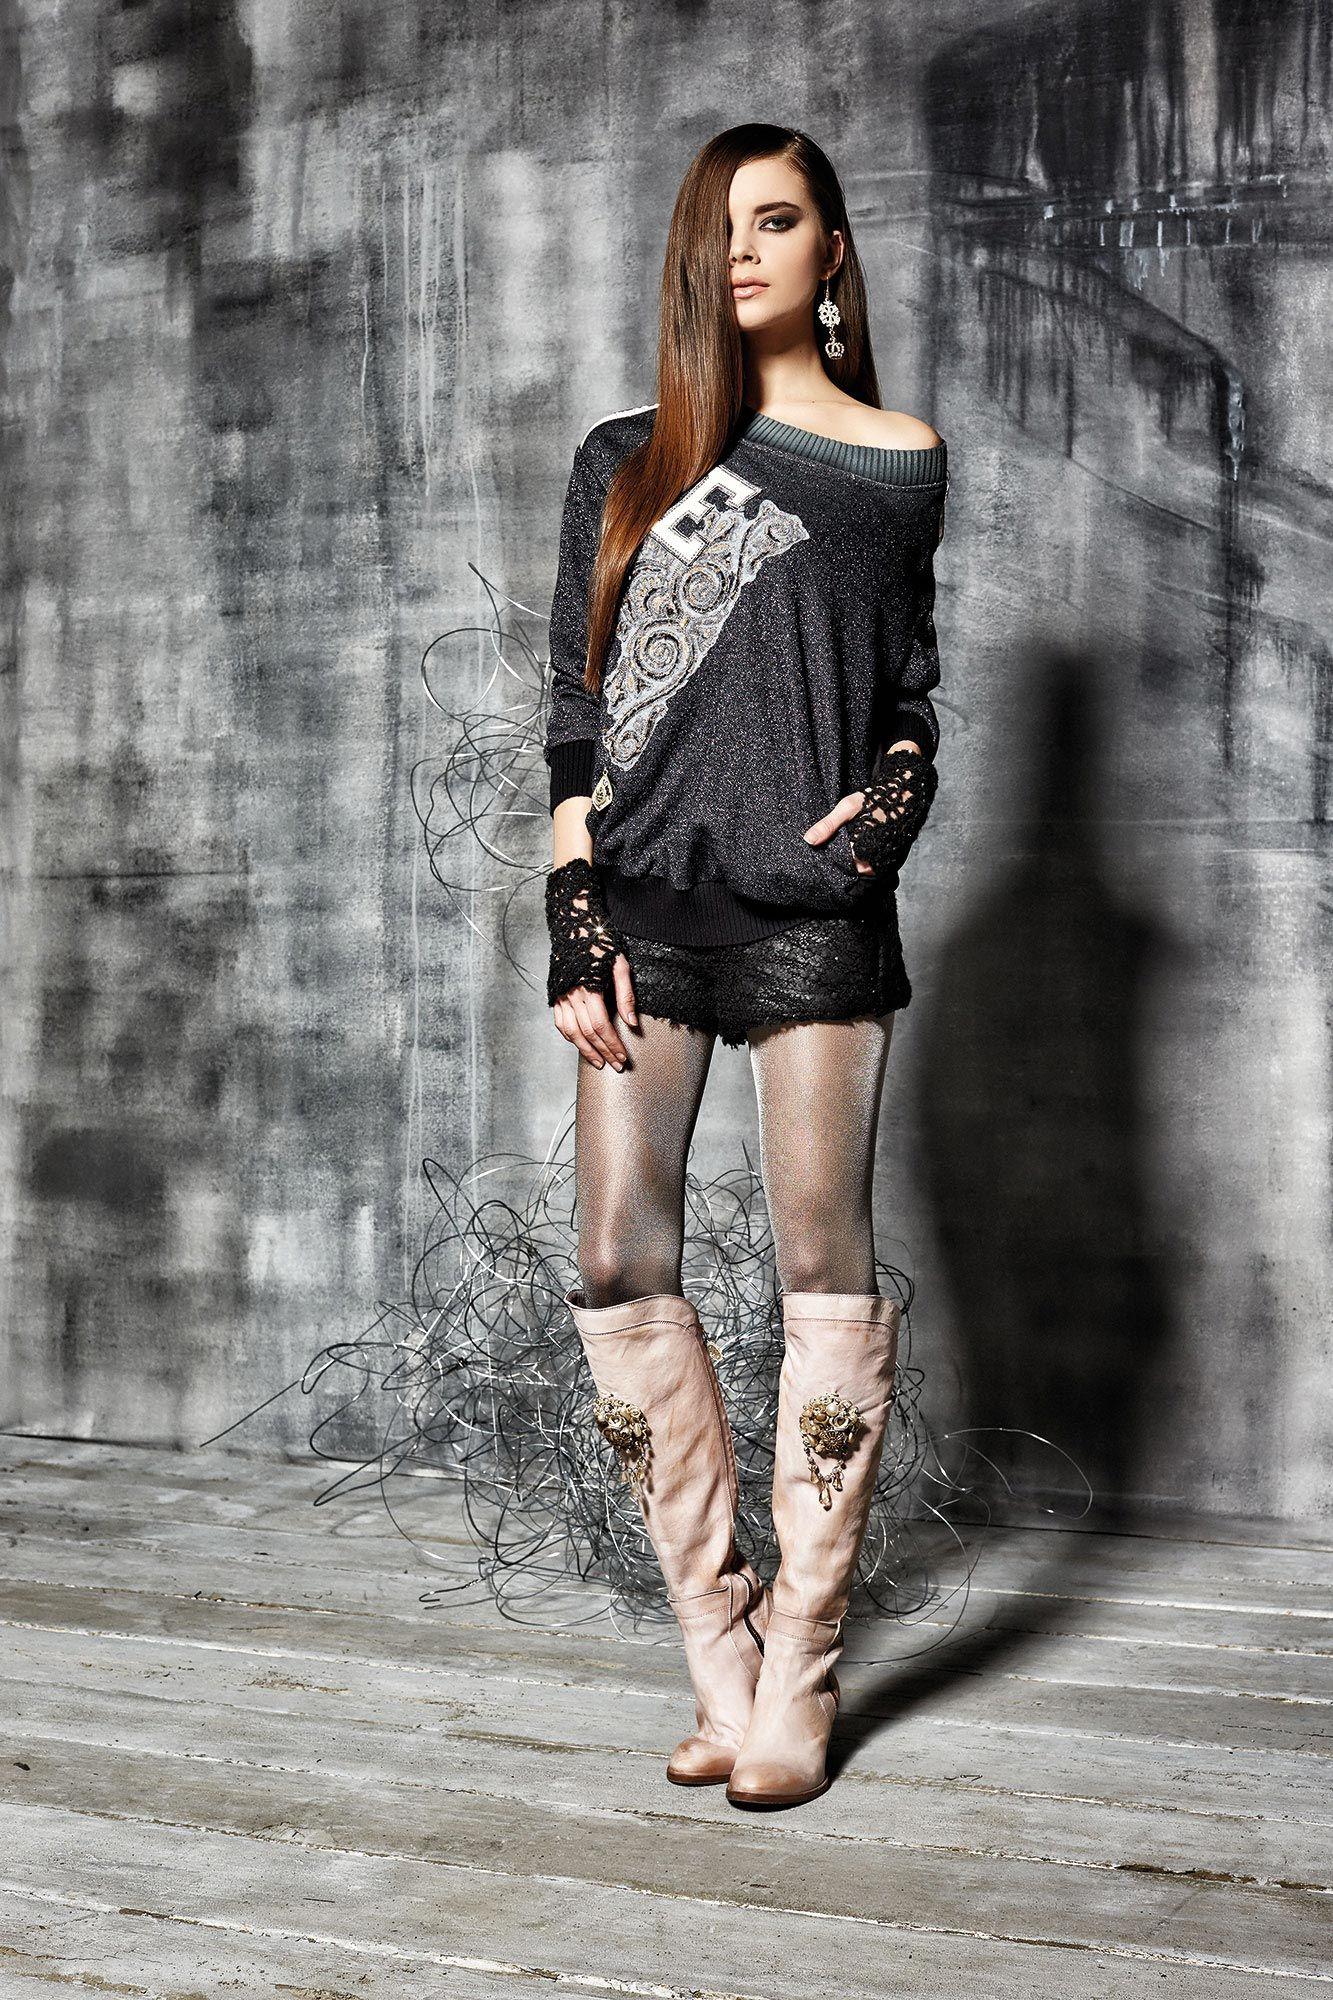 #danieladallavalle #collection #elisacavaletti #fw15 #grey #black #tshirt #shorts #boots